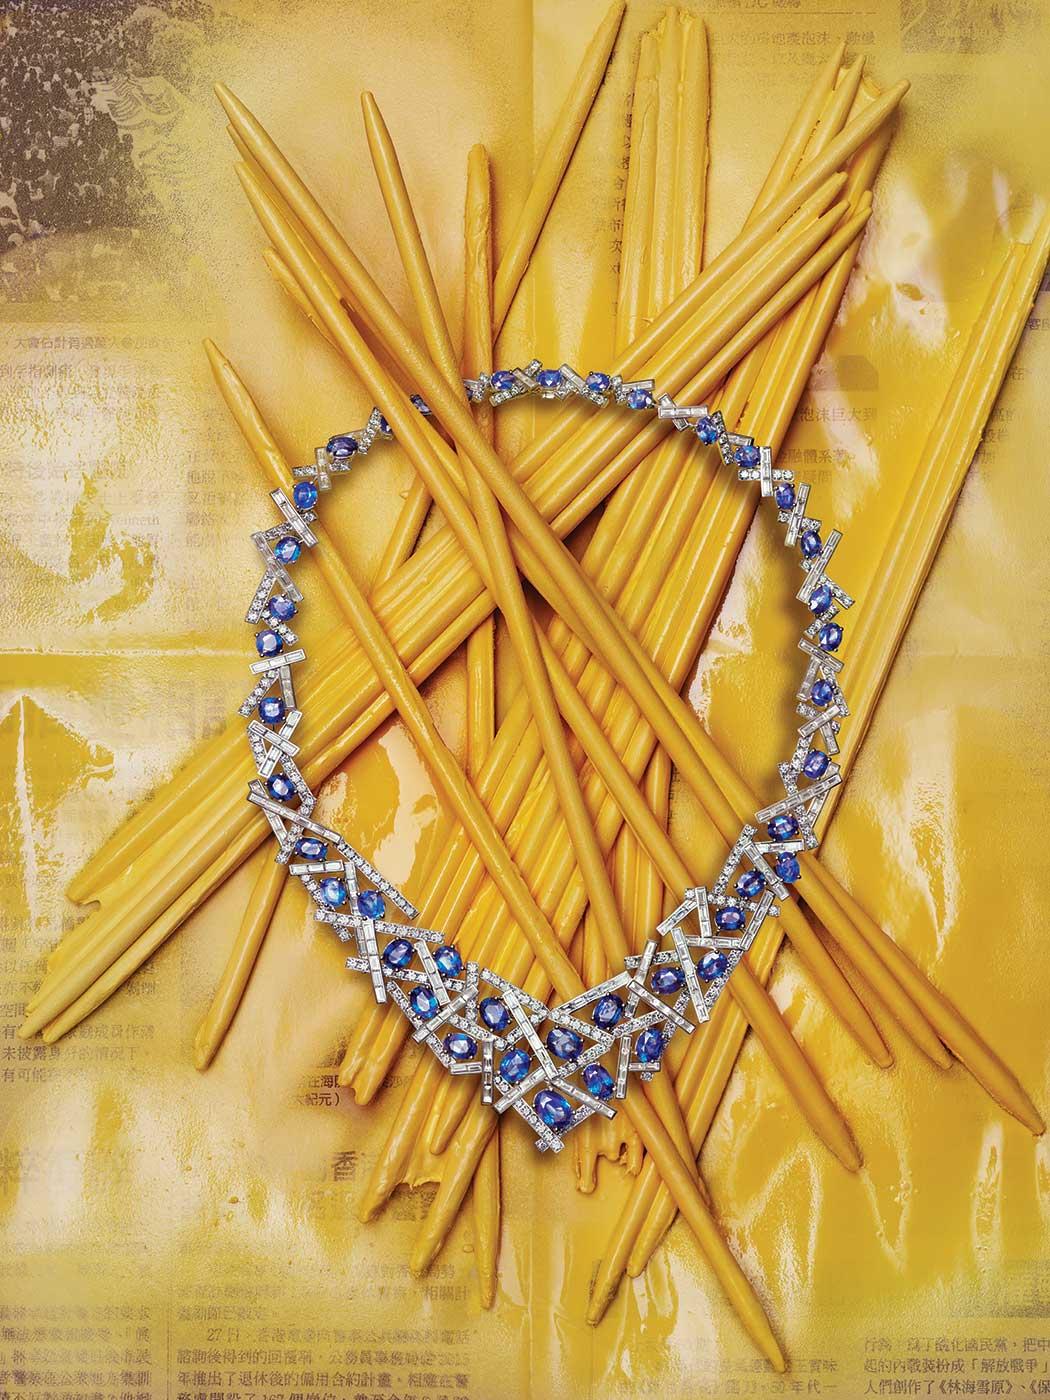 191029-WSJ-Spring20-Jewelry_Box-Graff_19198_v2_CMYK_QC